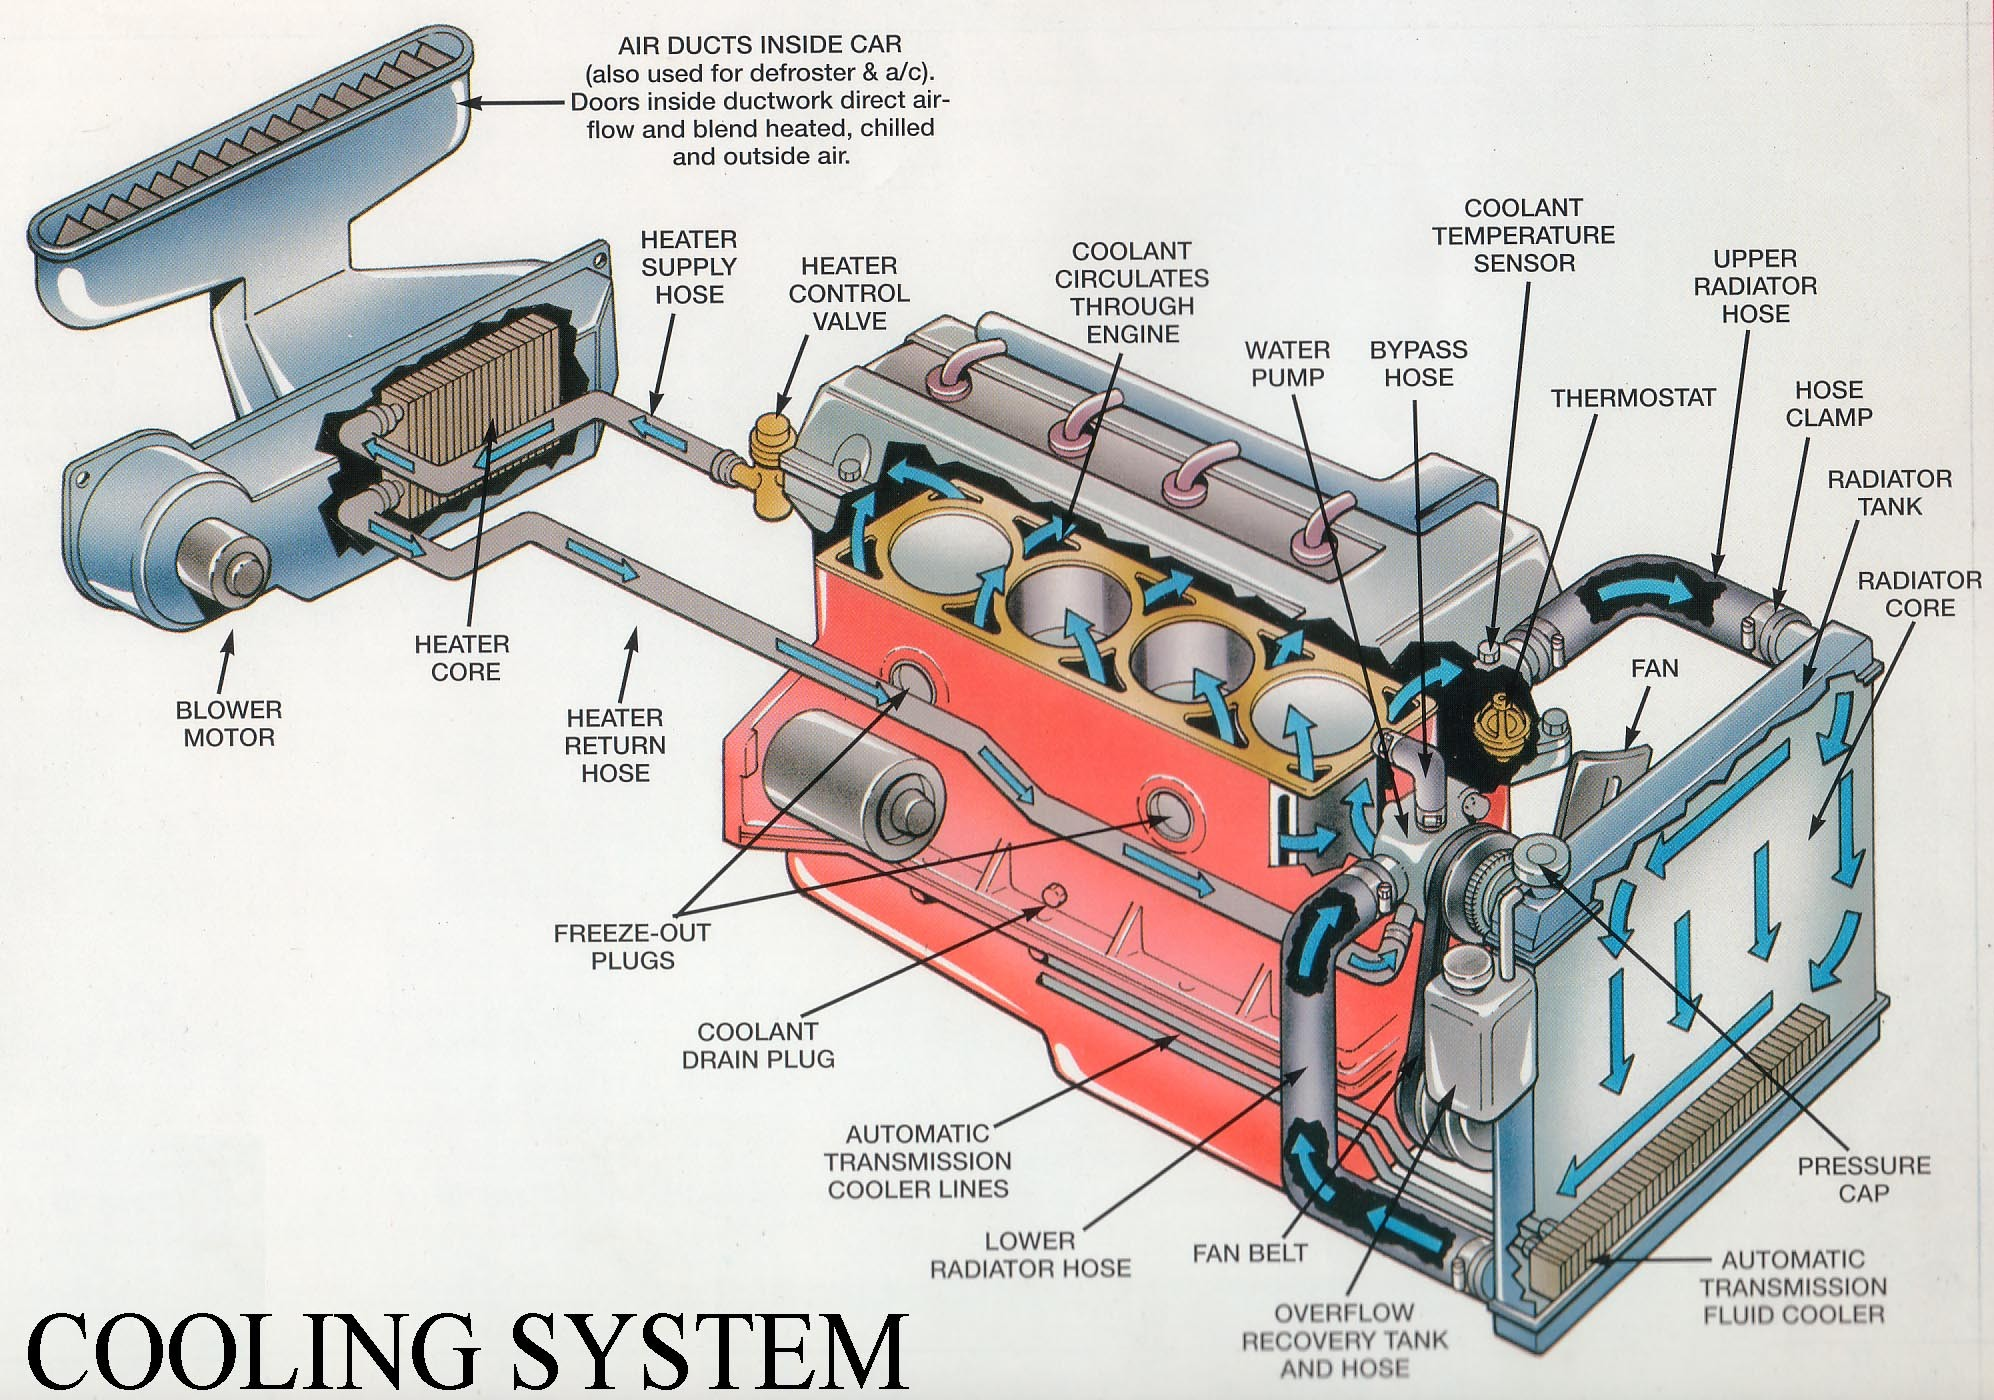 Diagram Of Car Cooling System Car Radiator Diagram Radiator Diagram Diagram Chart Gallery Of Diagram Of Car Cooling System